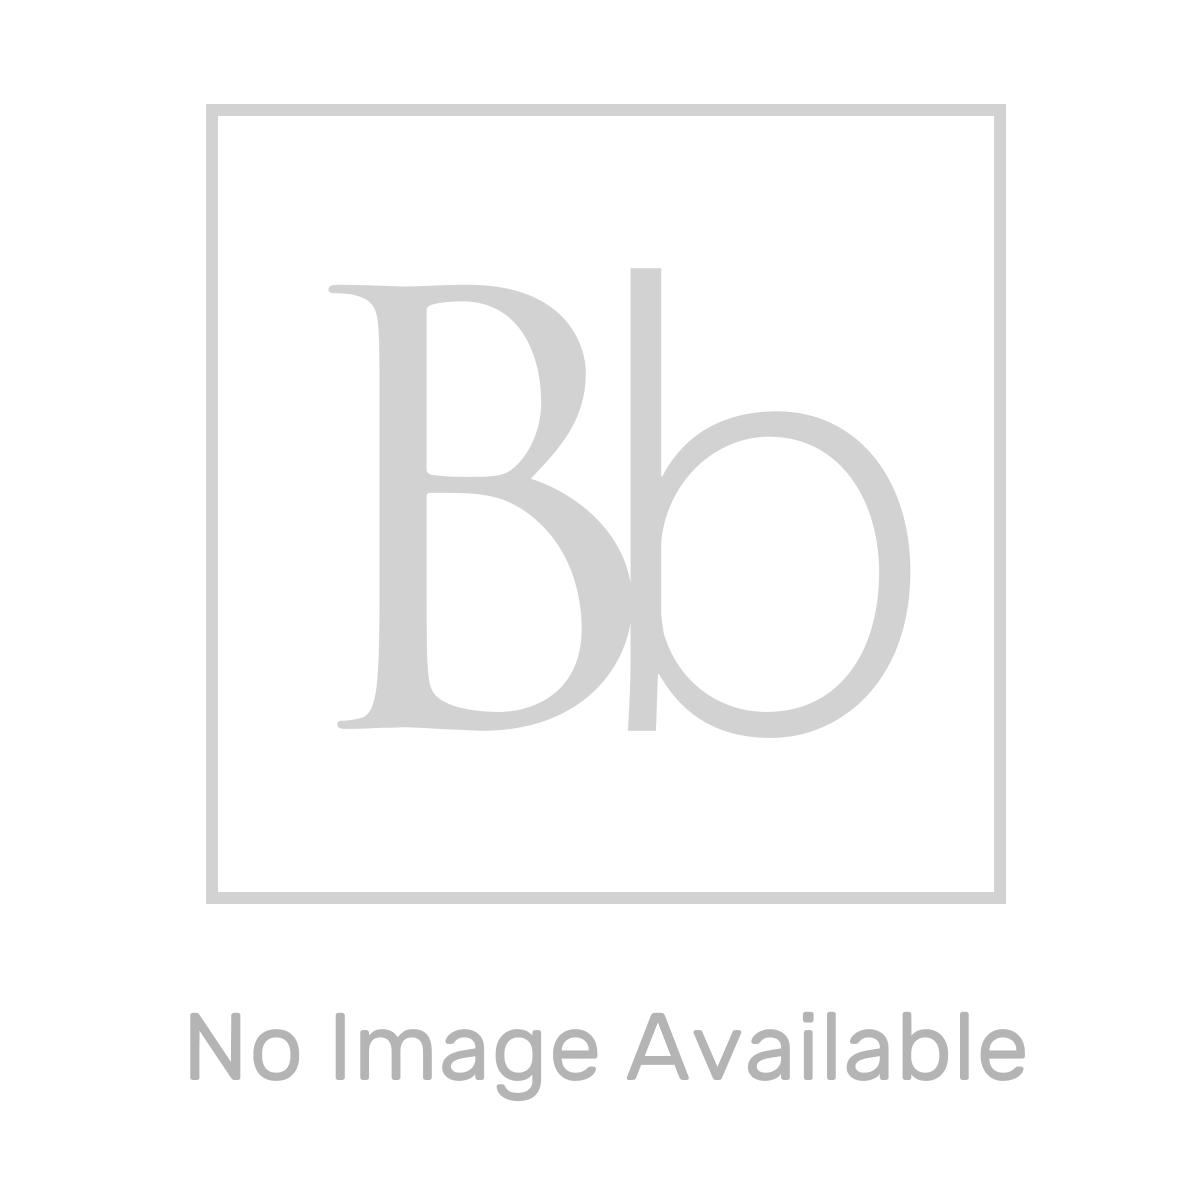 Aquadart Aqualavo Black Slate Shower Tray 1500 x 760 Overhead